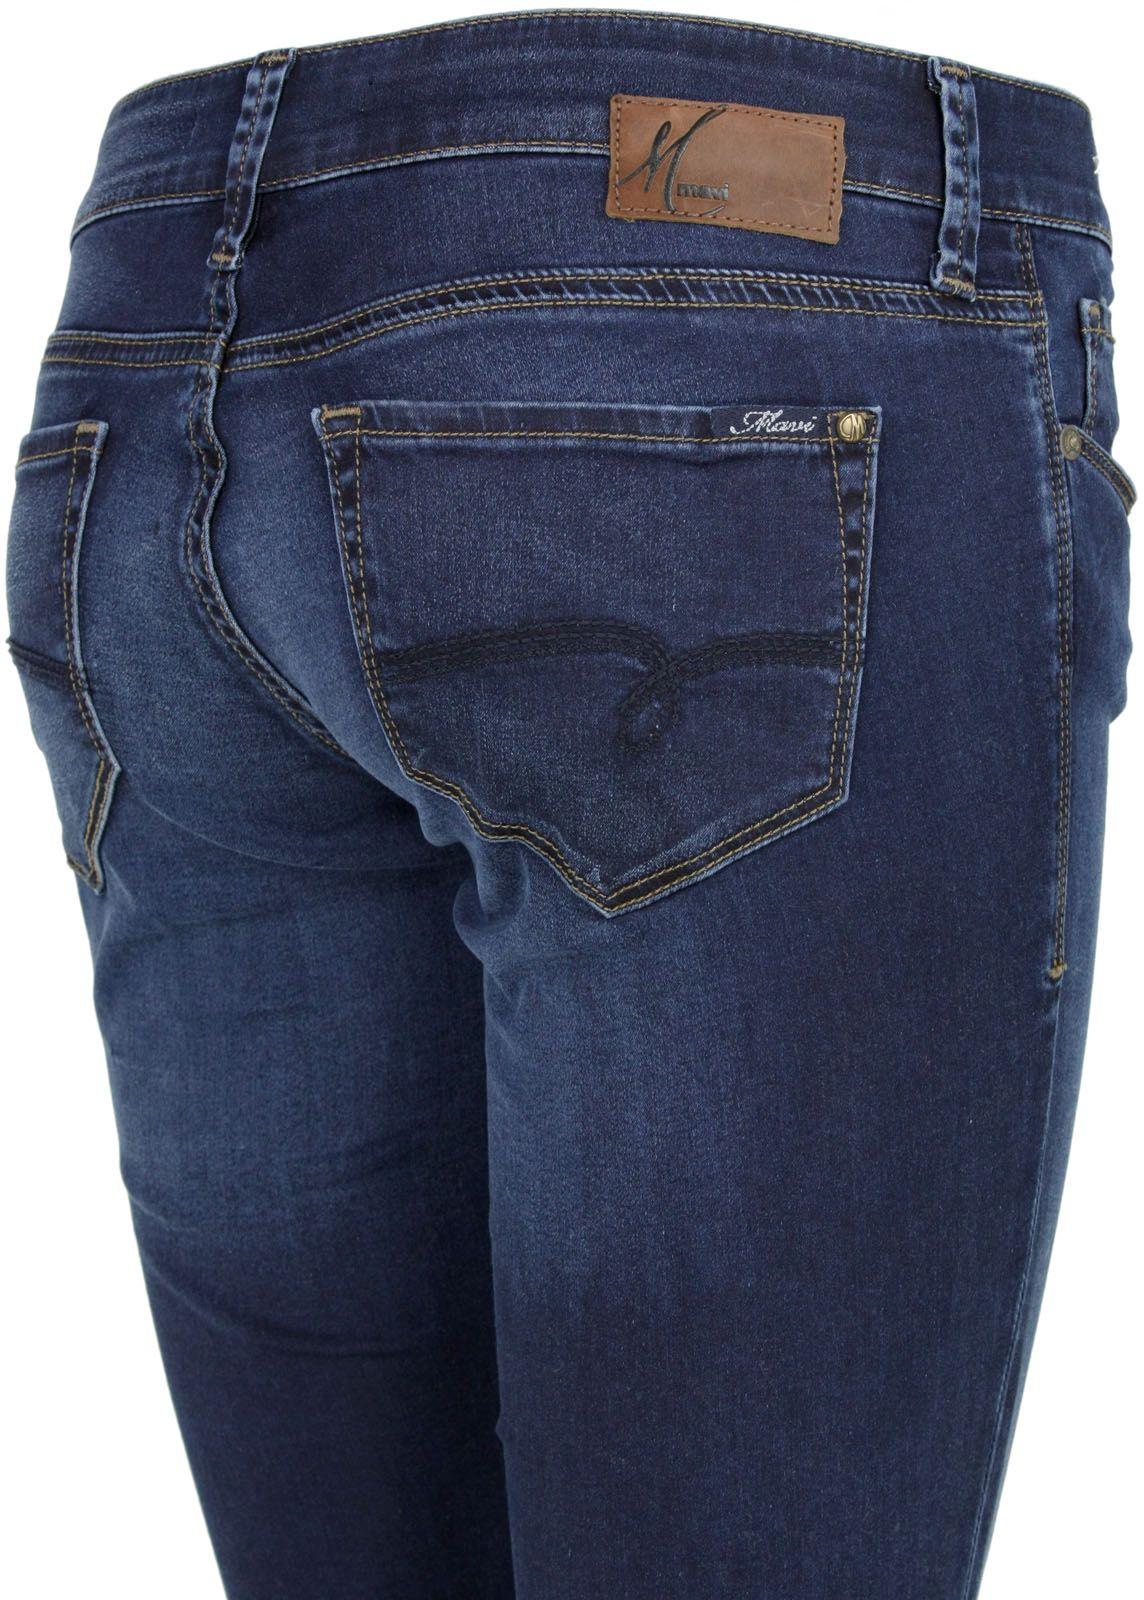 Mavi clothing online